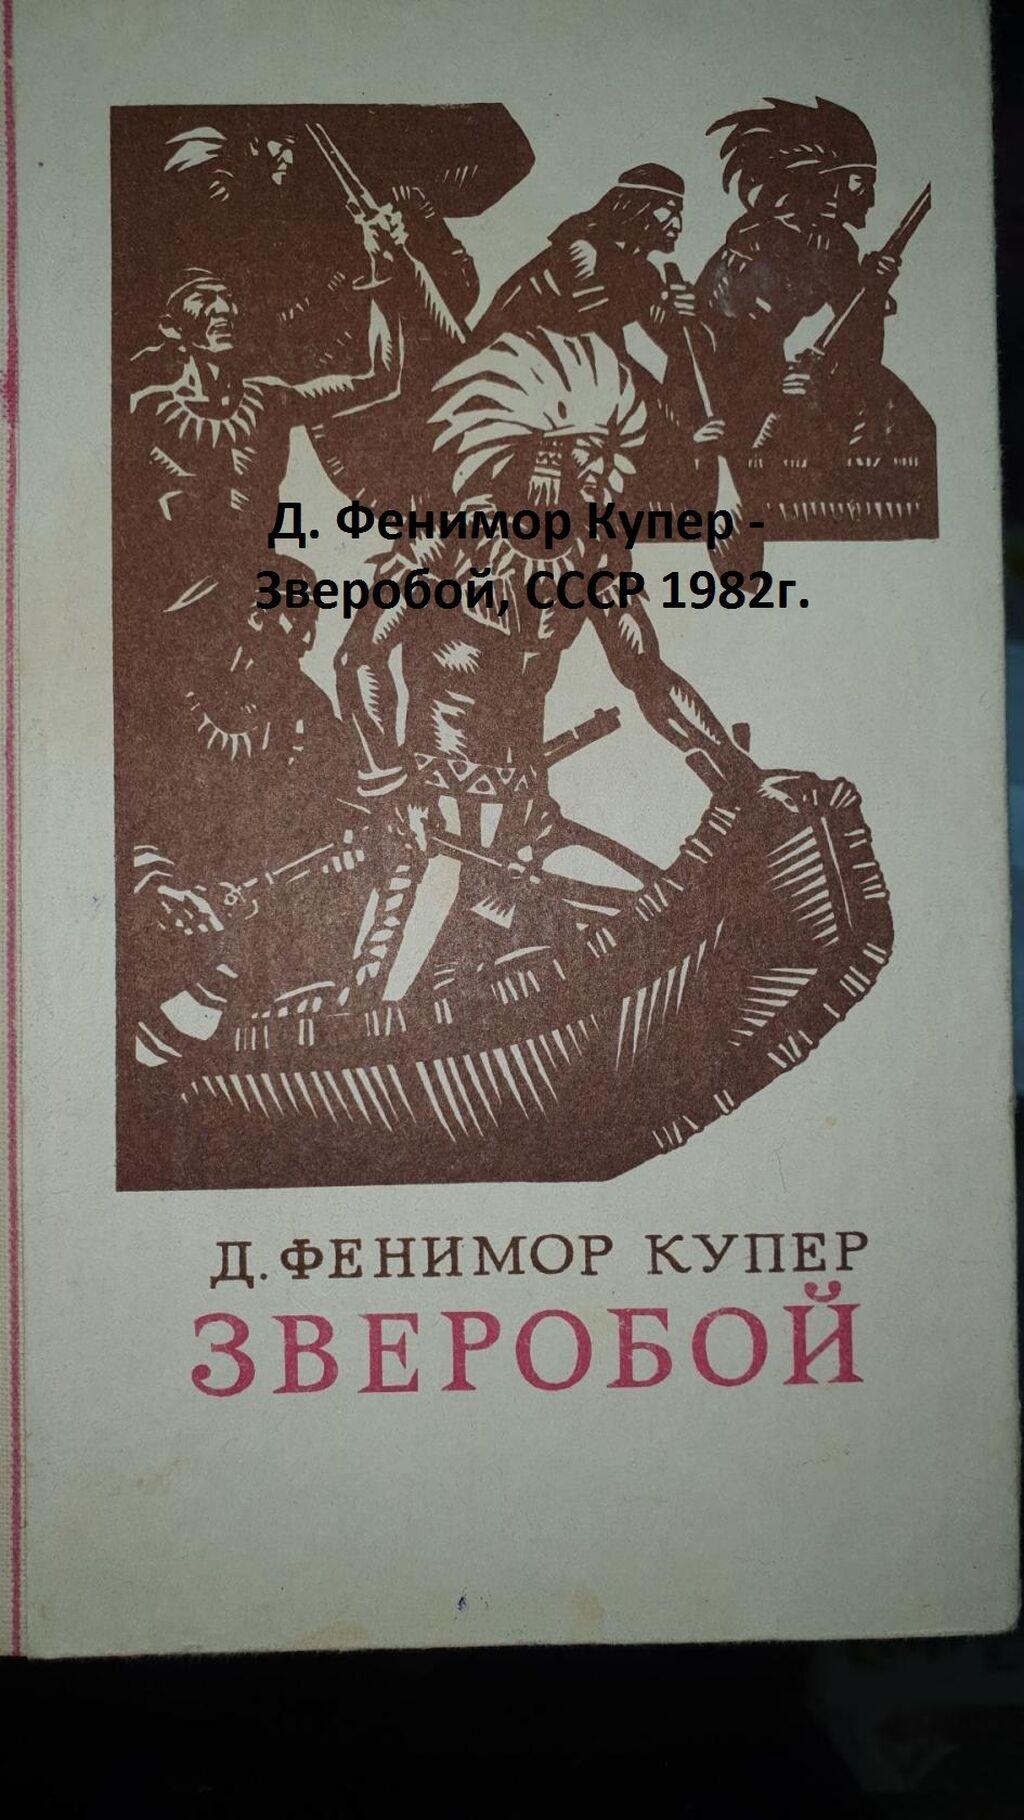 Д. Фенимор Купер - Зверобой, СССР 1982г.   (Whatsapp): Д. Фенимор Купер - Зверобой, СССР 1982г.   (Whatsapp)